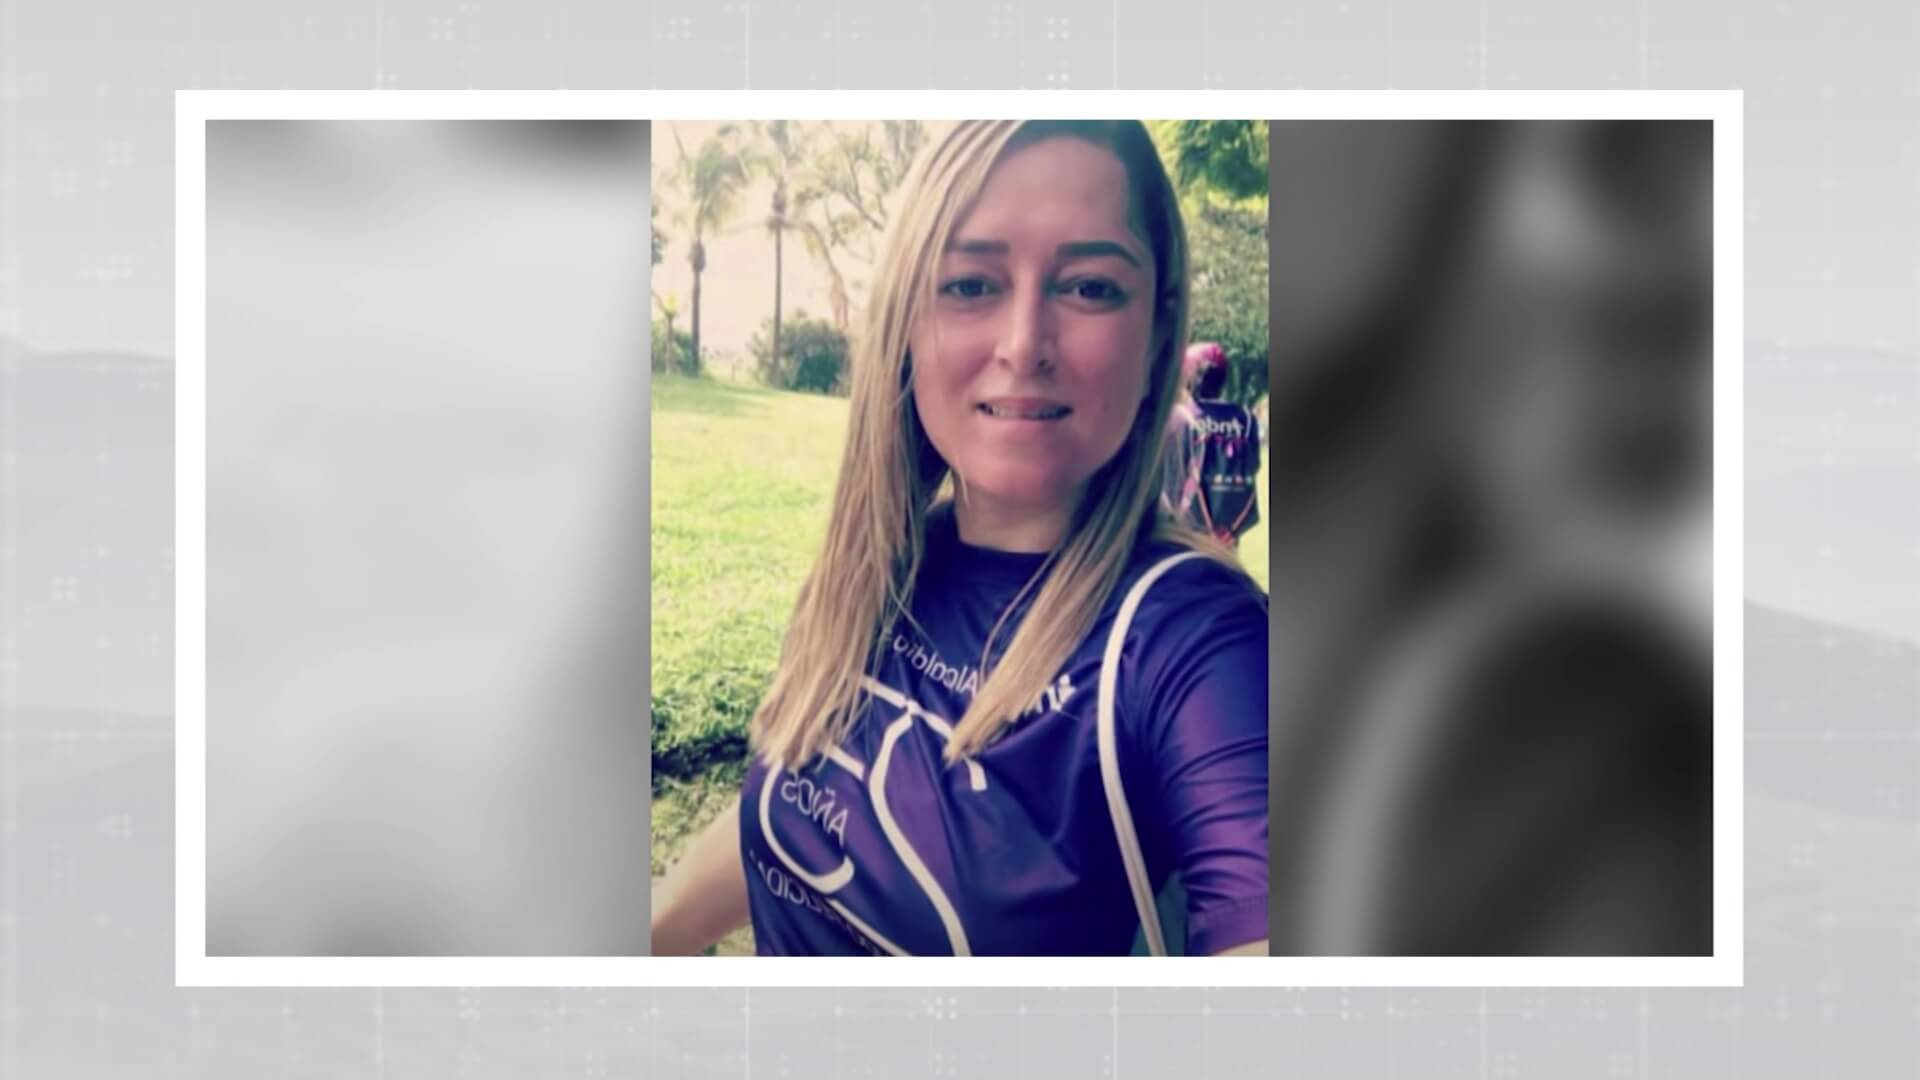 Encuentran sin vida a Catalina Pérez Pulgarín